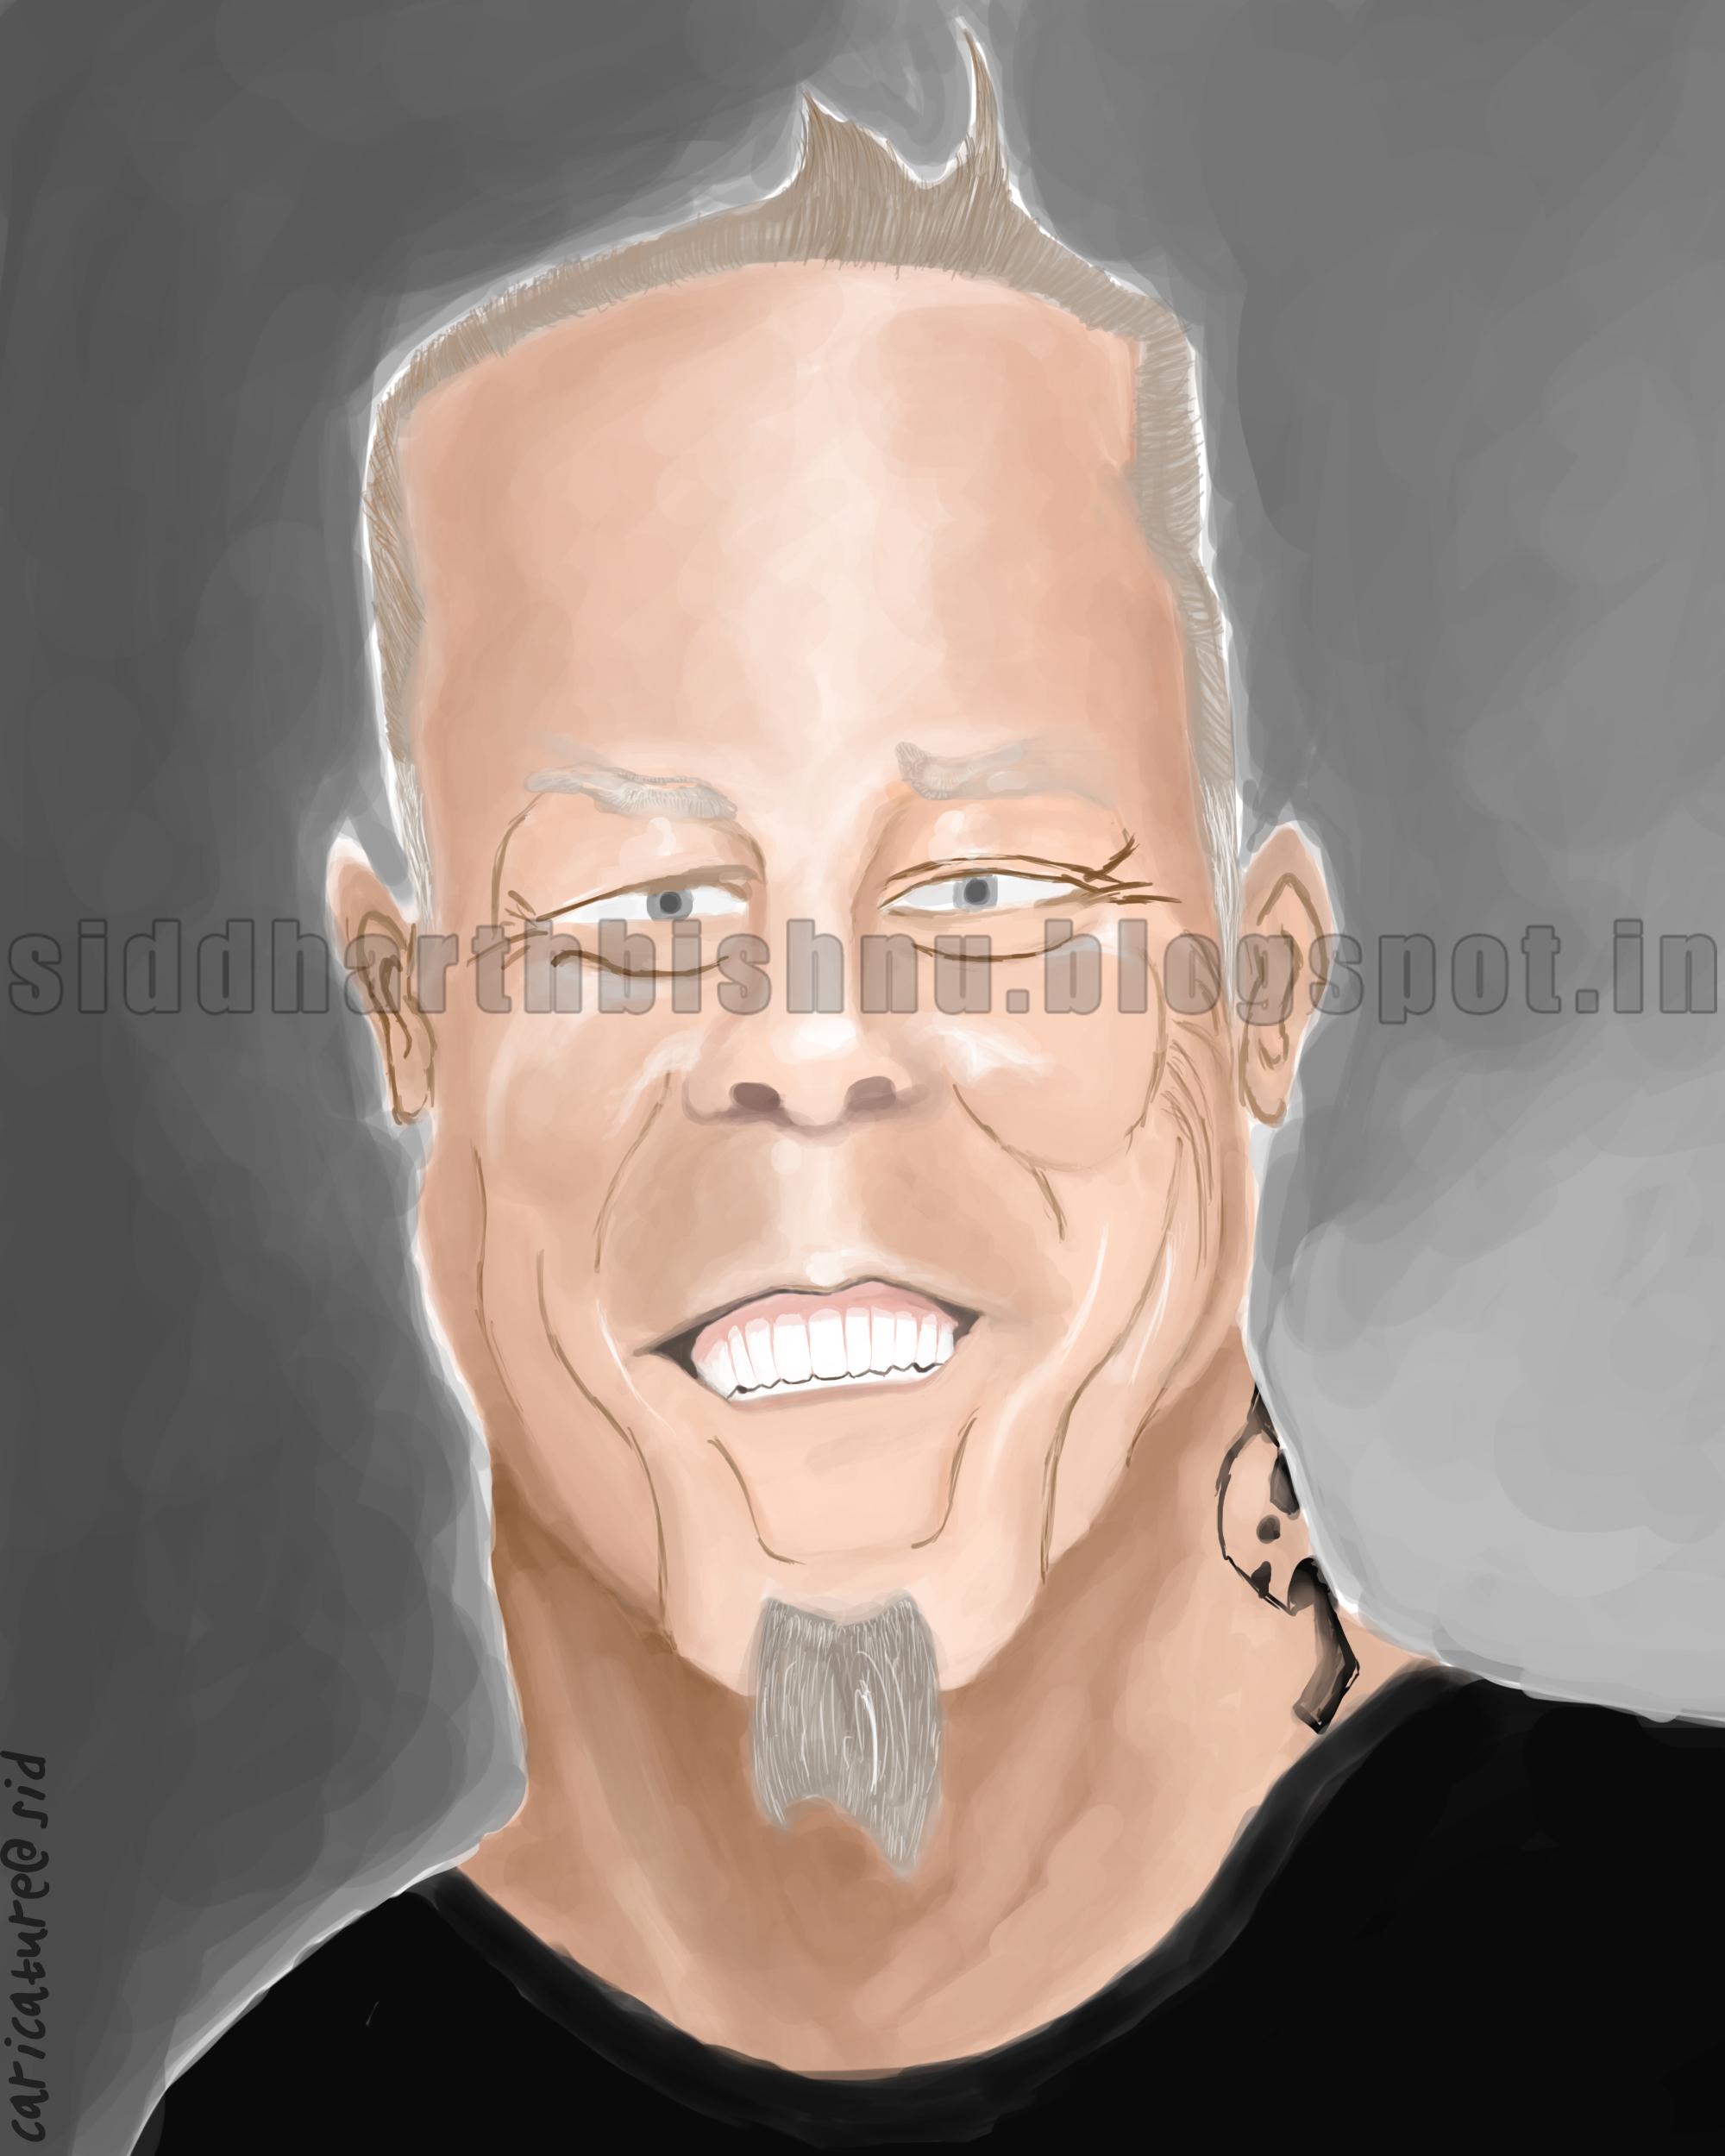 5301718_142435457521_Metallica_james.jpg